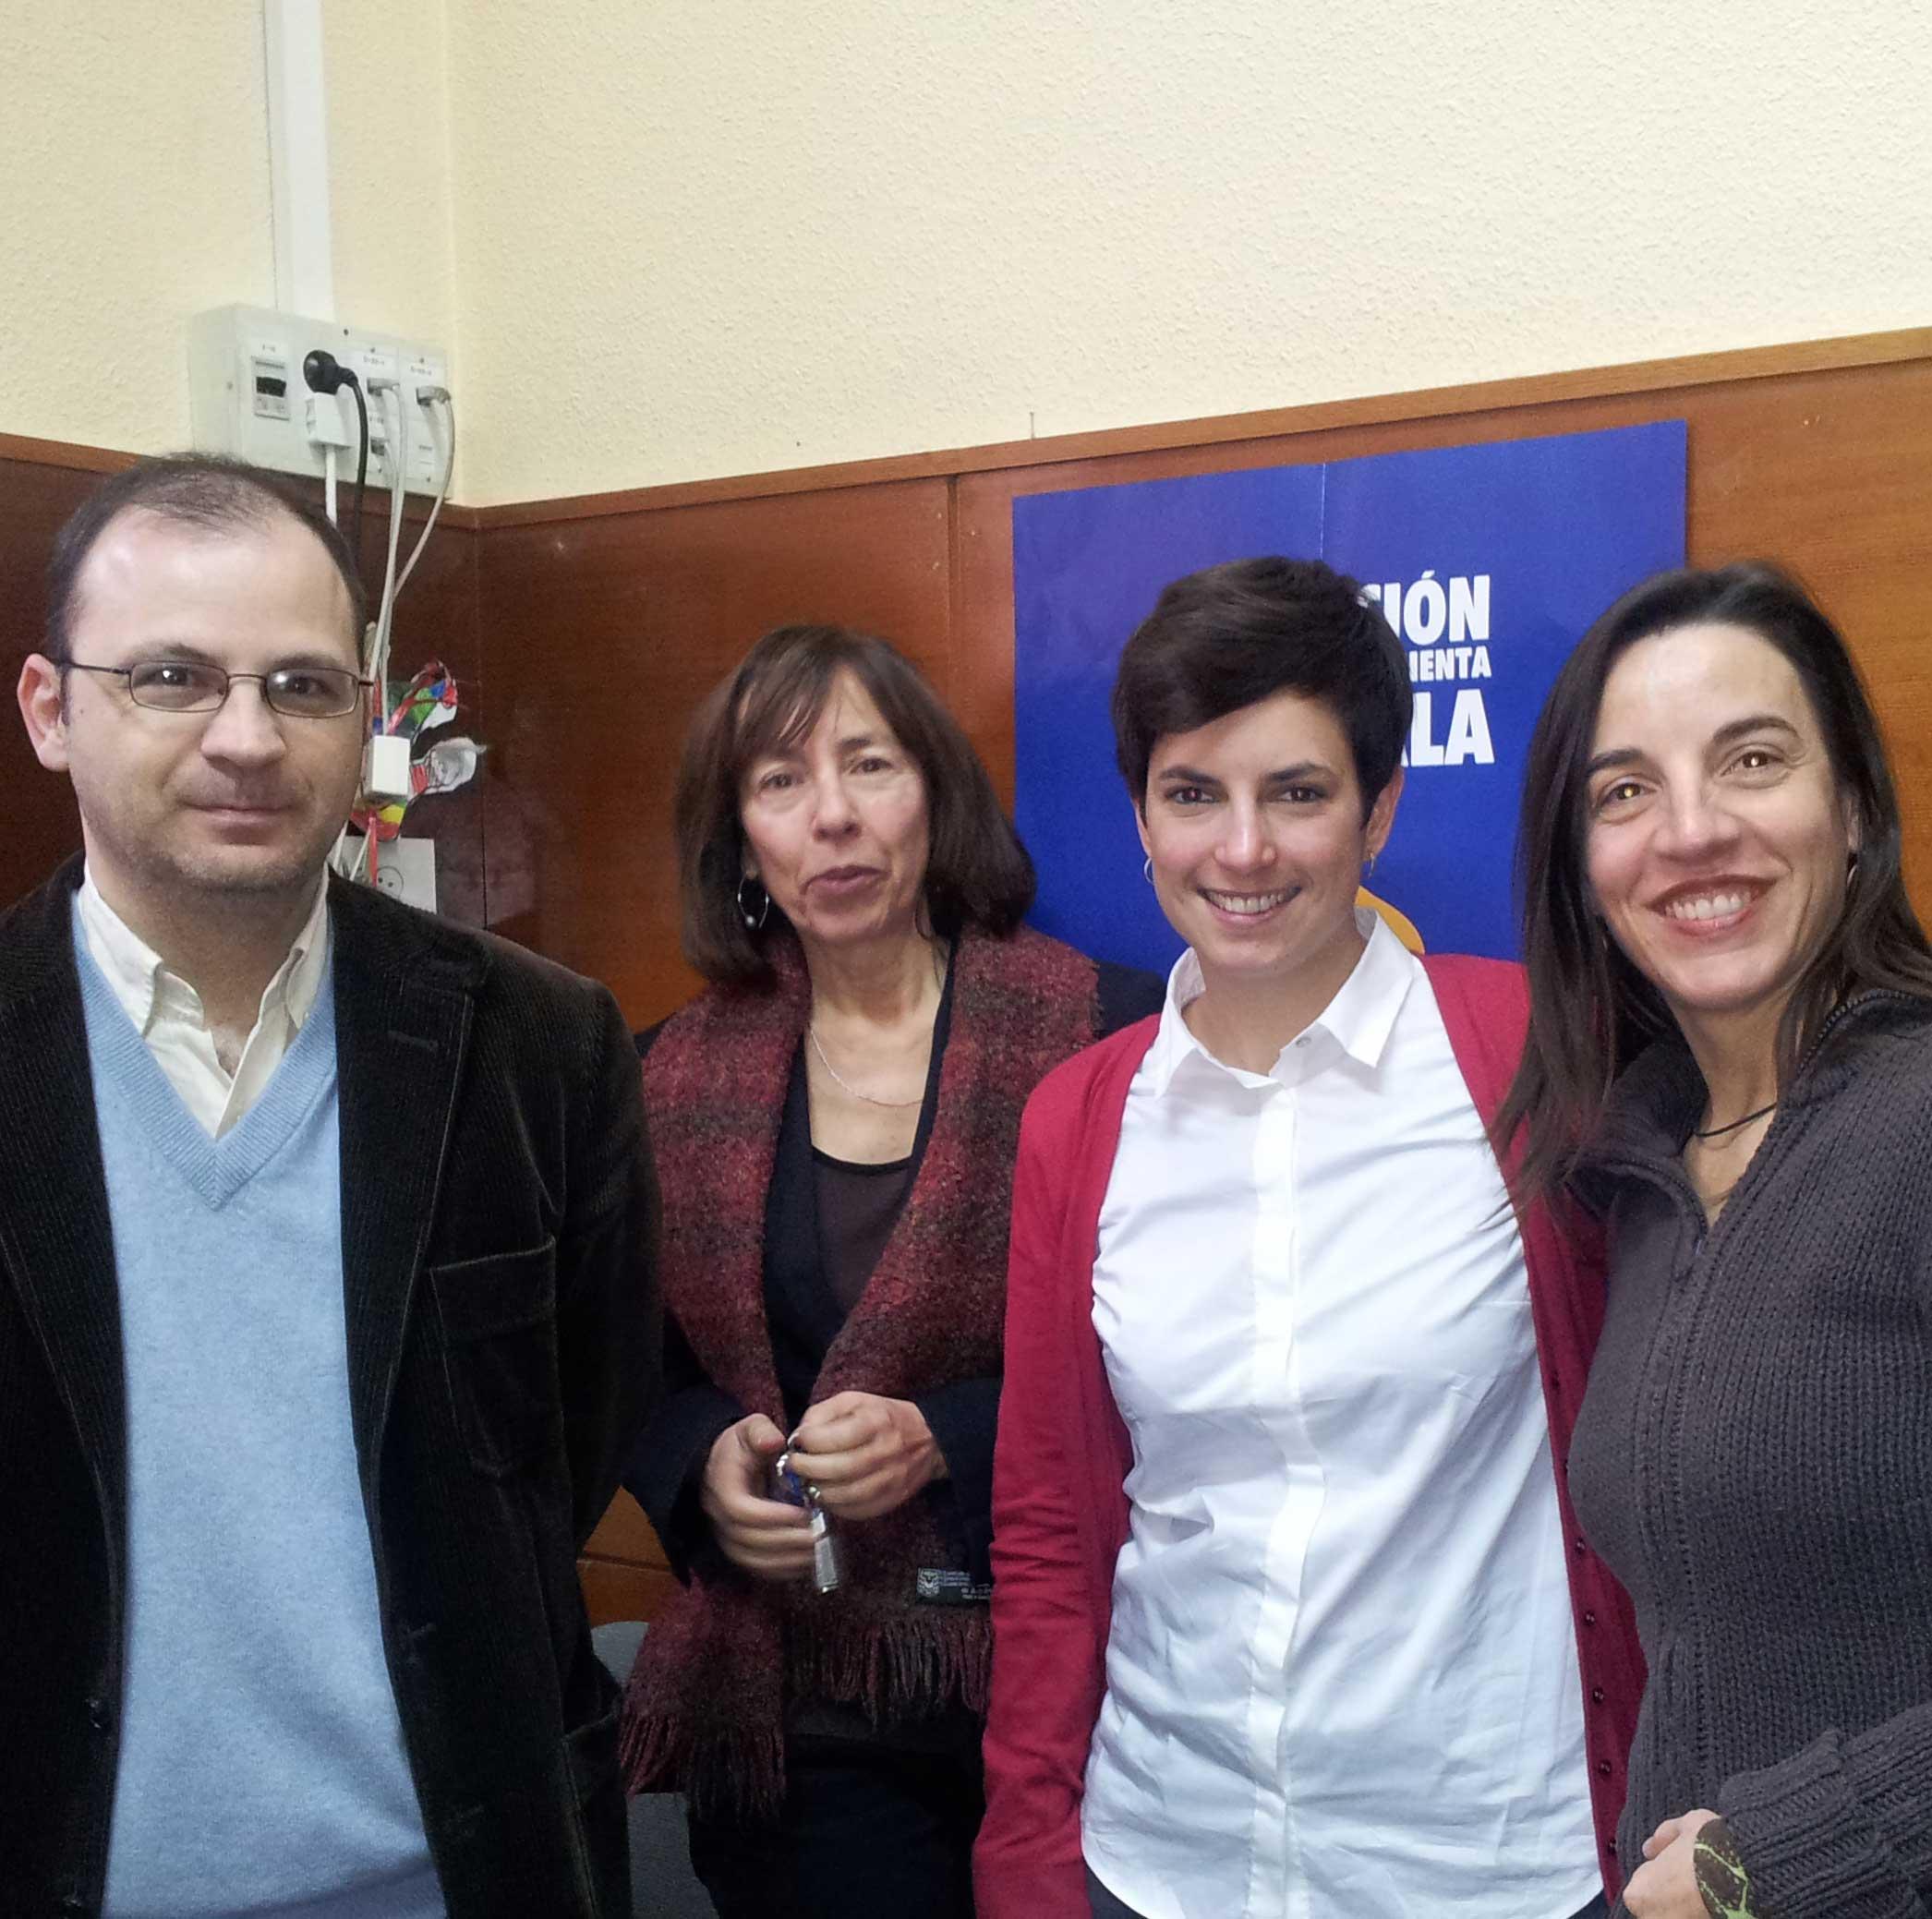 María Silveria Agulló Tomás, Mª Victoria Gómez García, Alberto Veira Ramos  Alba Gil Callado